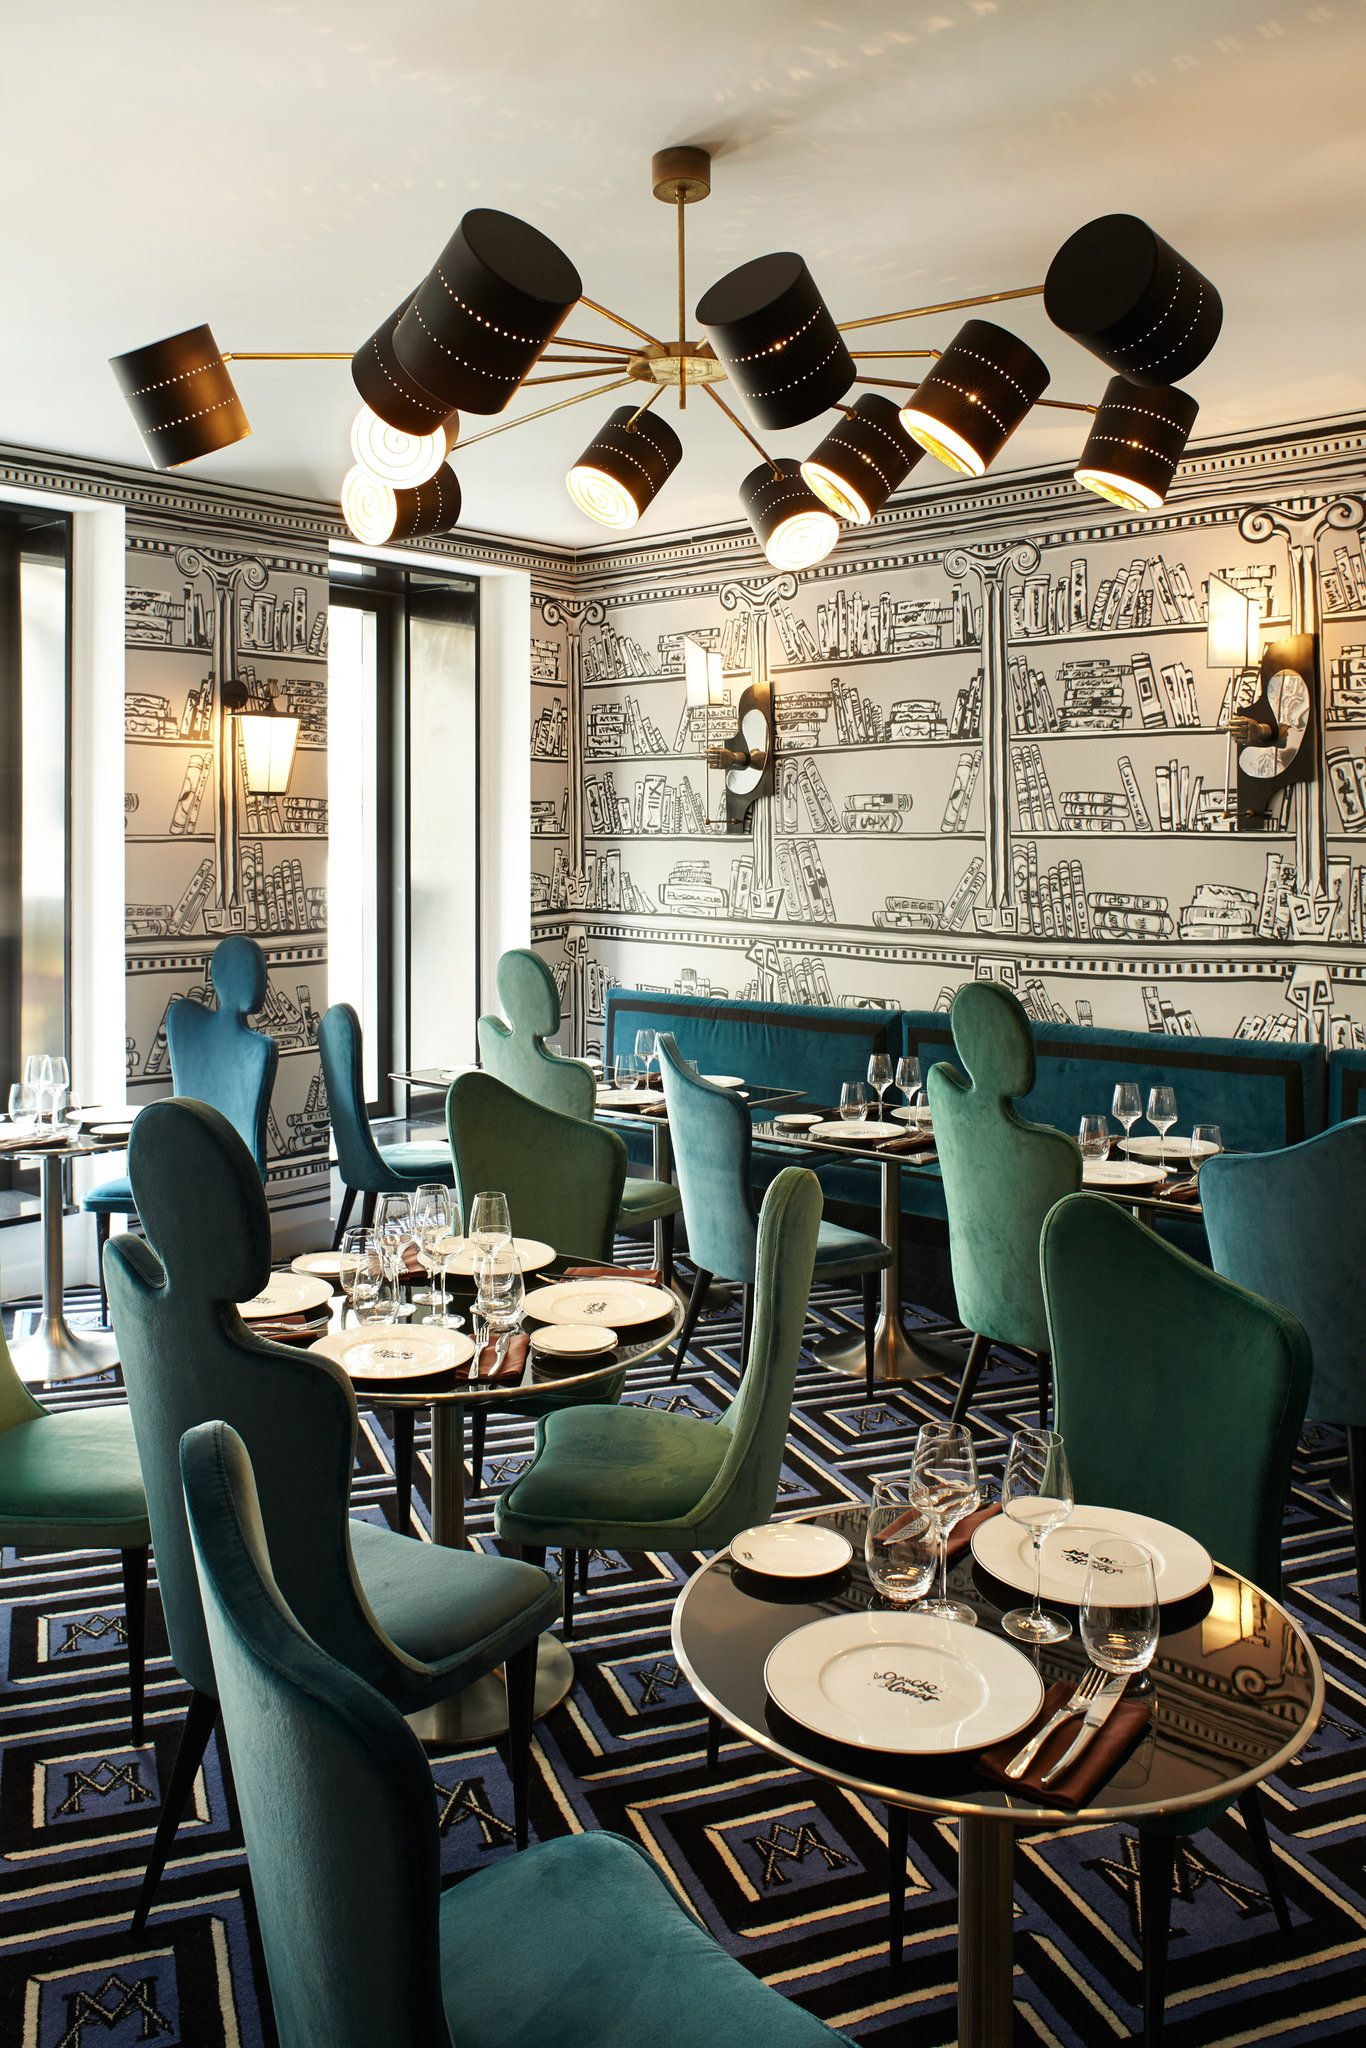 sofa lounge cafe amman menu quality sofas watford the restaurant le gauche cavier at paris 39s hotel montana